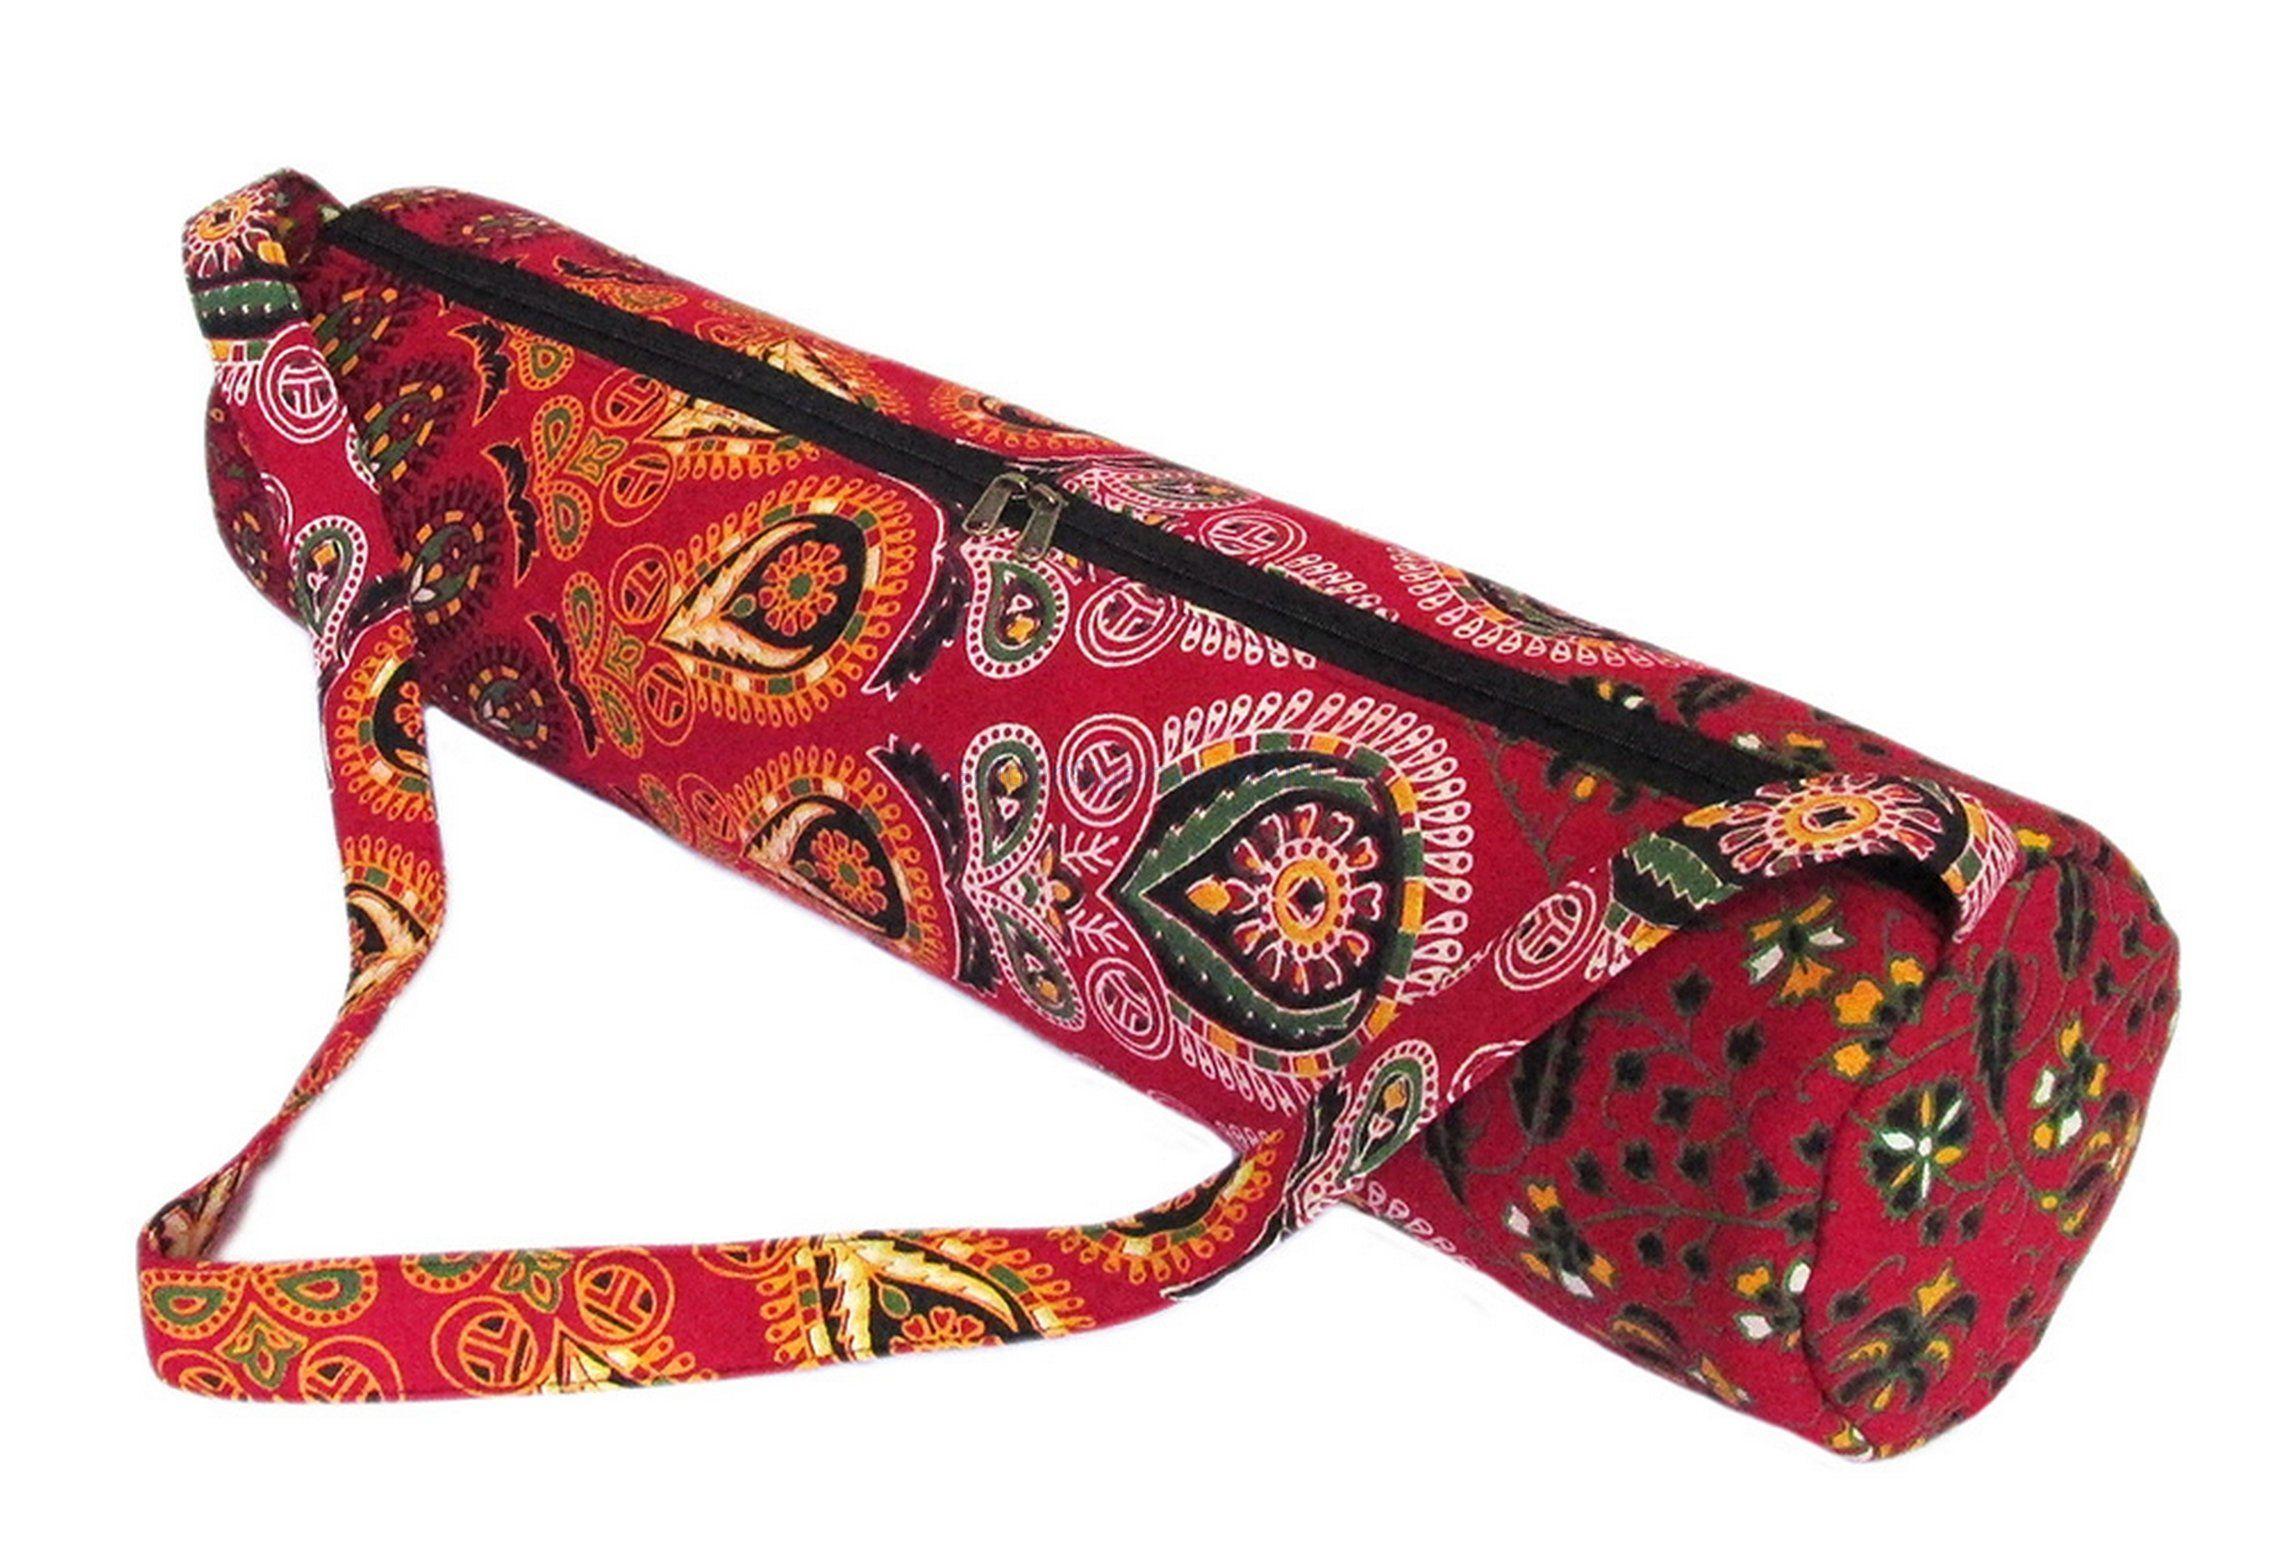 Indian Mandala Yoga Mat Bag Handmade Carry Beach Bags Cotton Etsy Yoga Mat Bag Yoga Bag Mat Bag